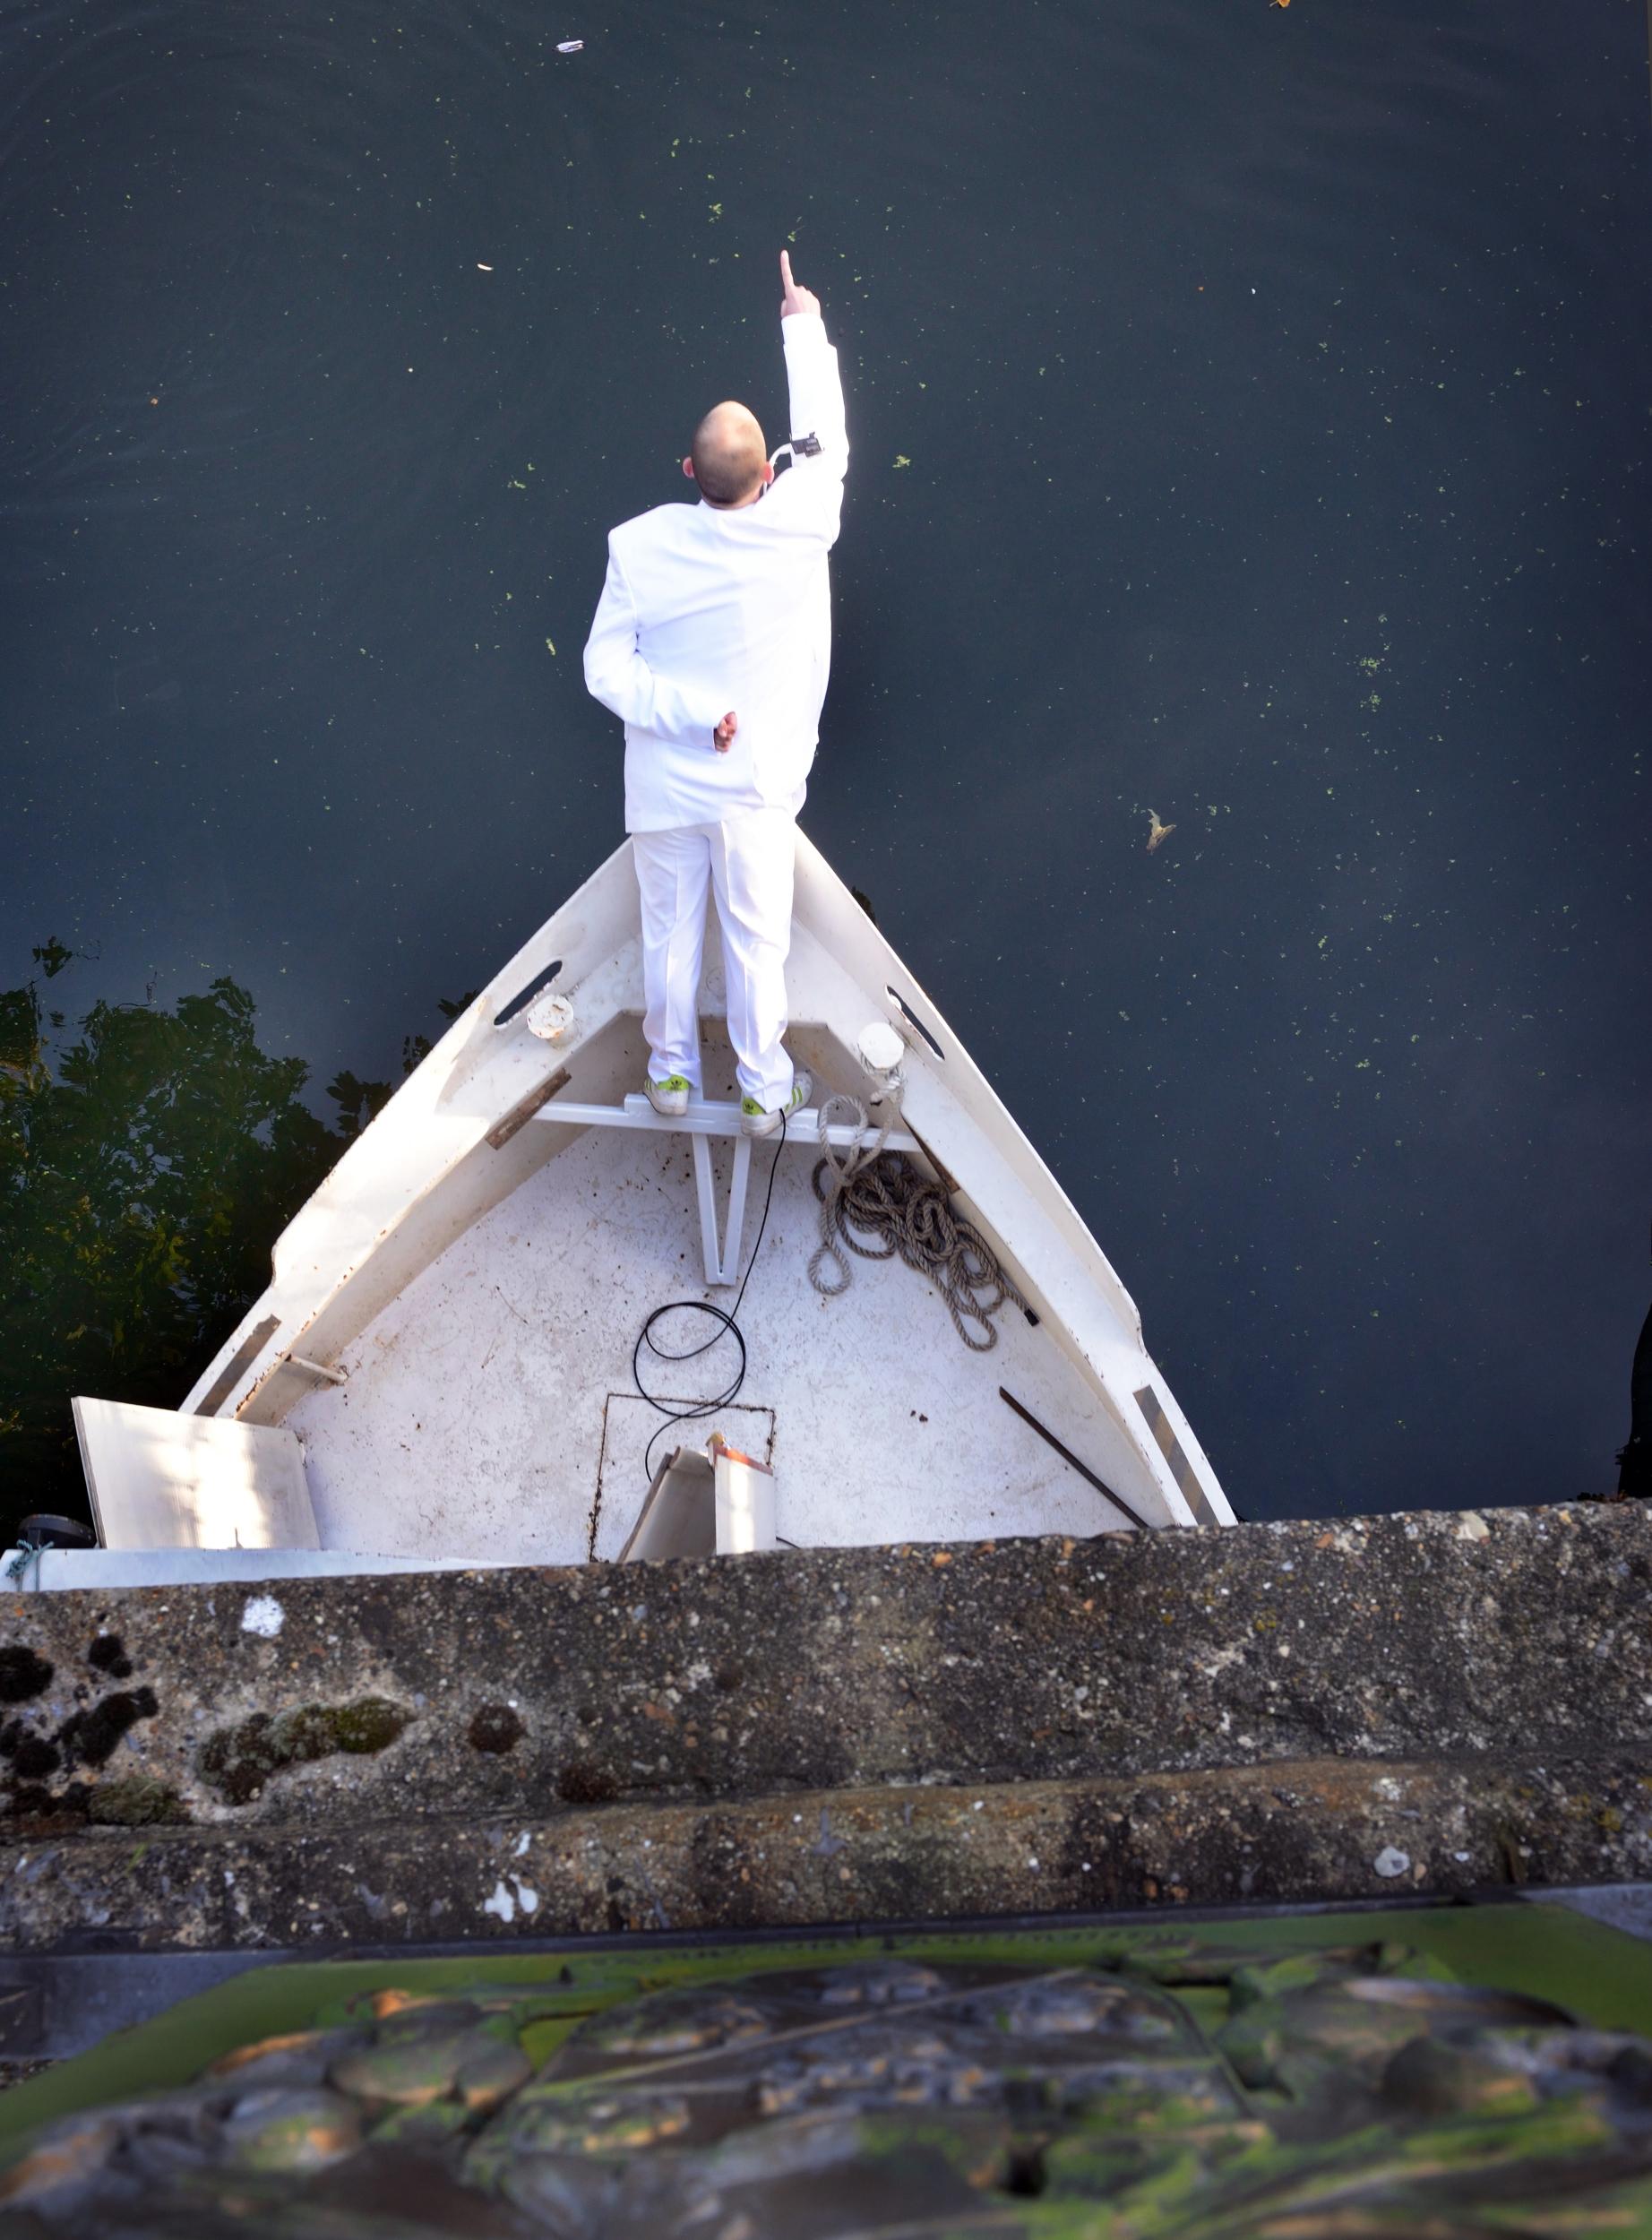 Alexander Costello,  Making Progress , performance, 2014, photo by AK Purkiss